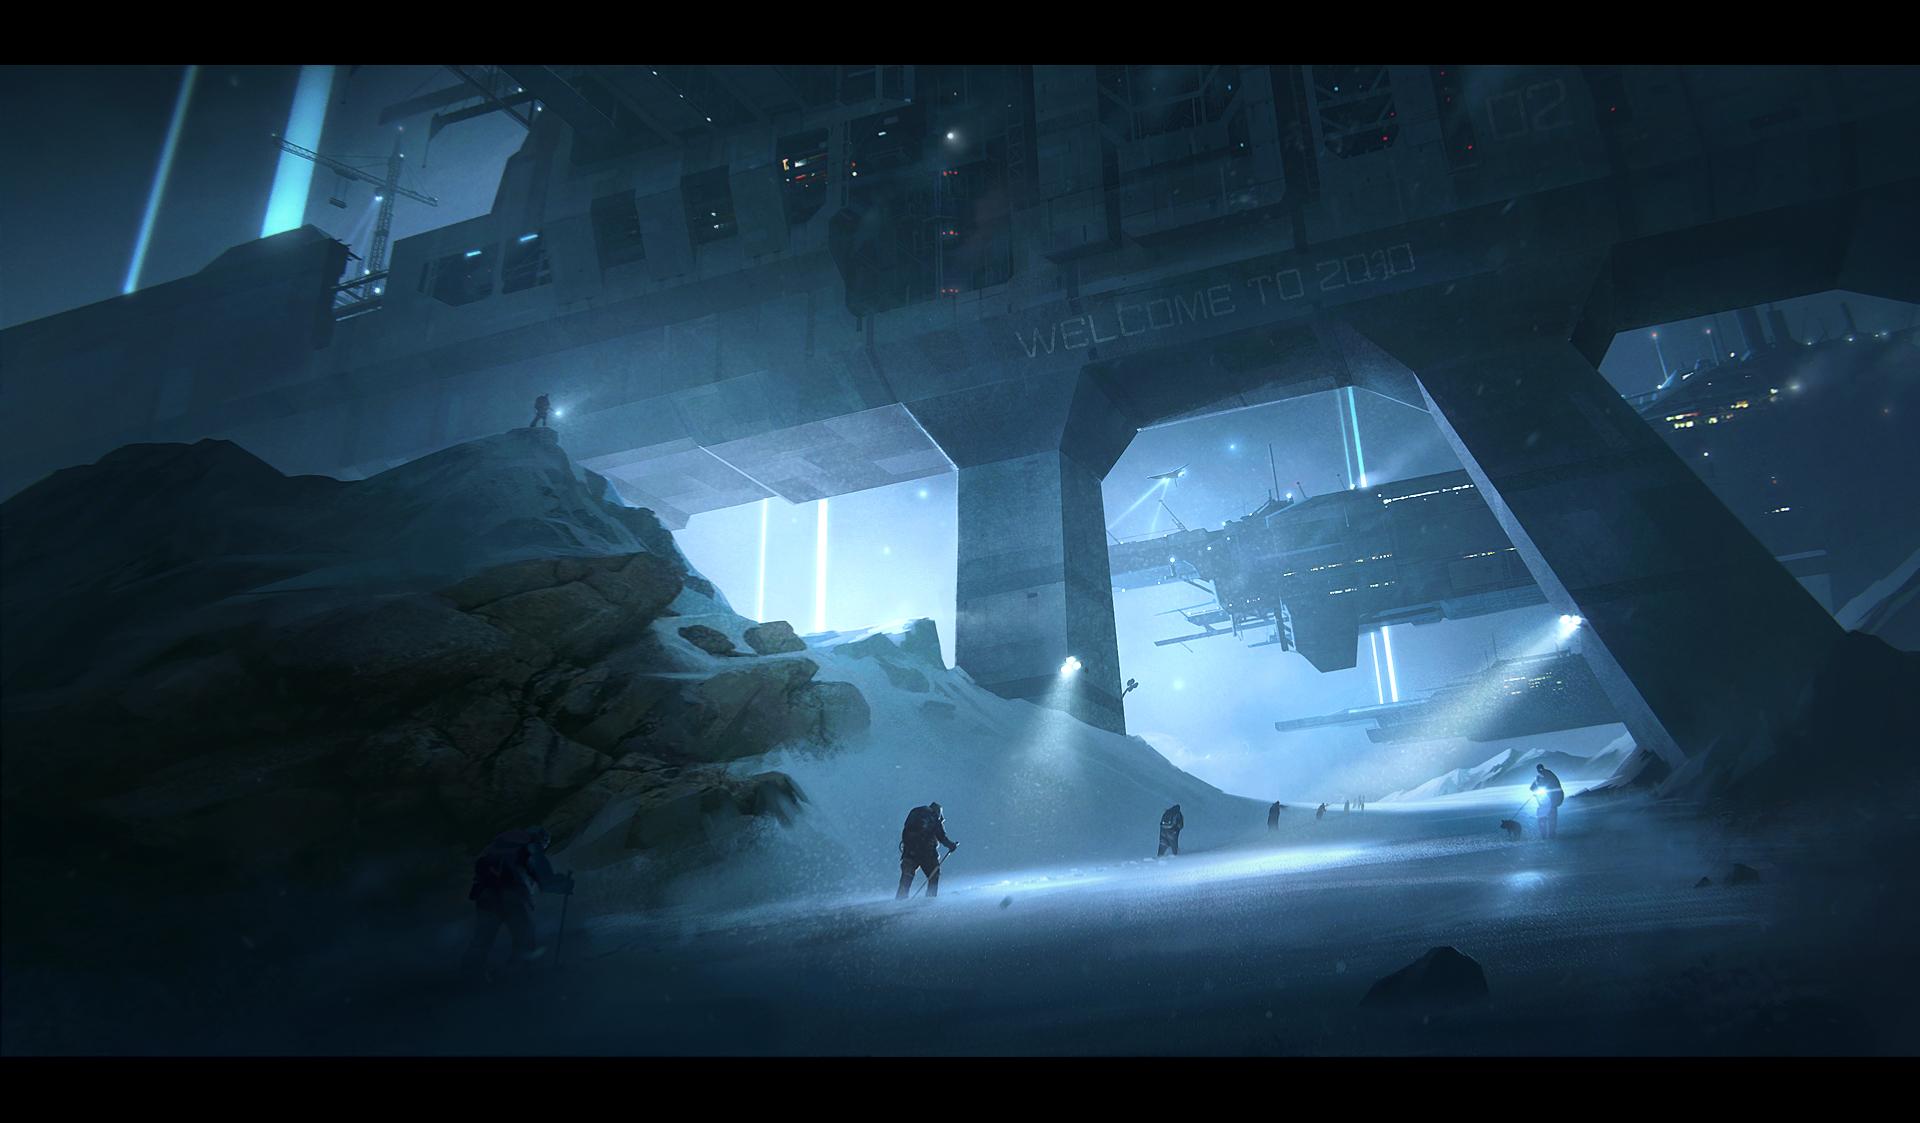 sci fi backgrounds - photo #26